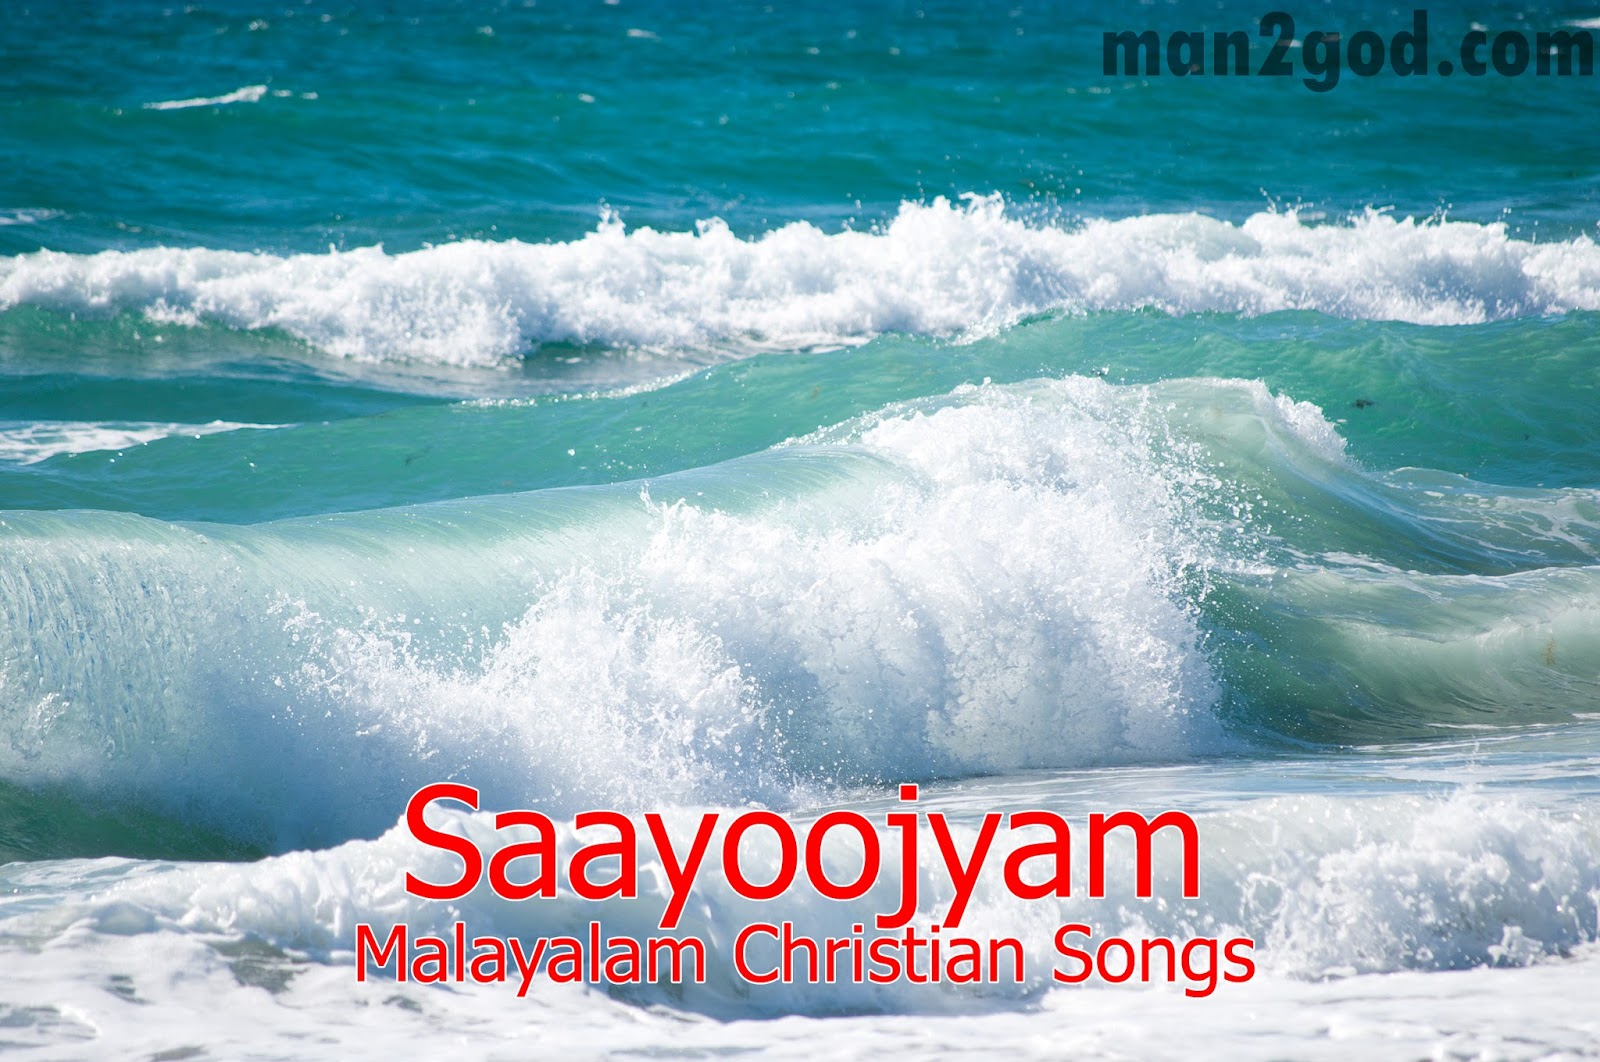 saayoojyam malayalam christian songs free download grace of god